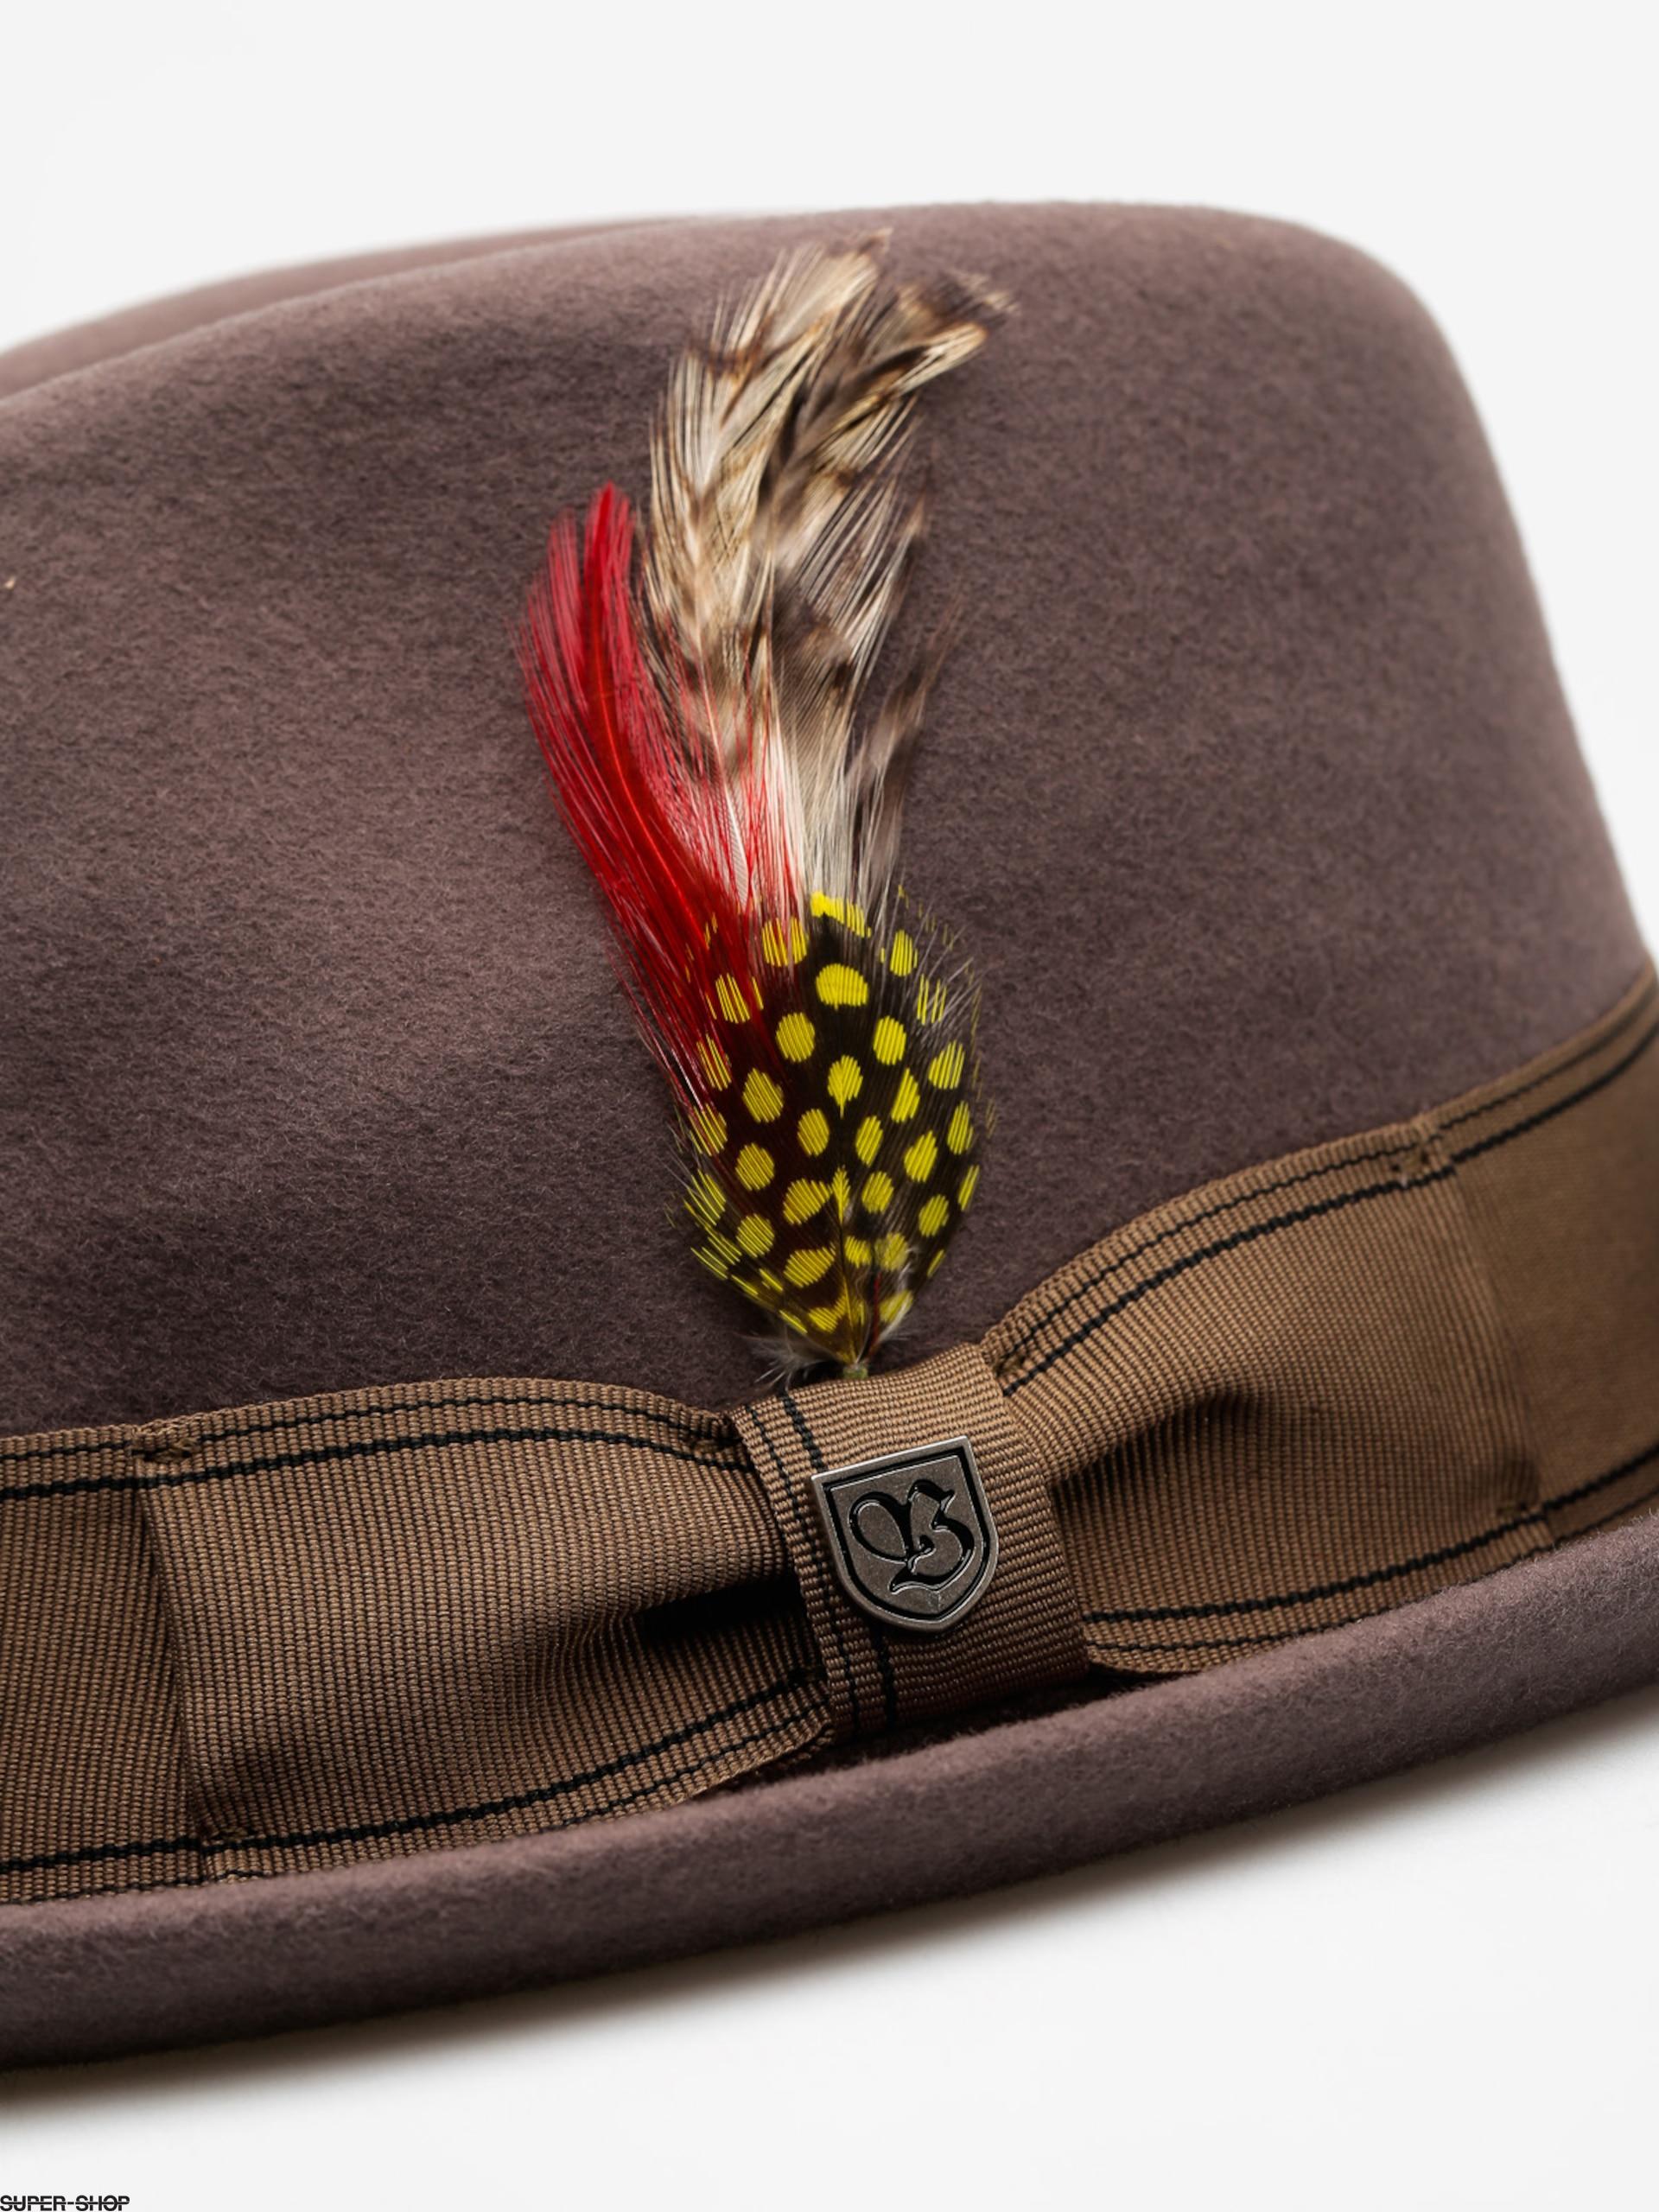 Cryptocurrency bank fedora hats for men kleinbettingen restaurant supplies